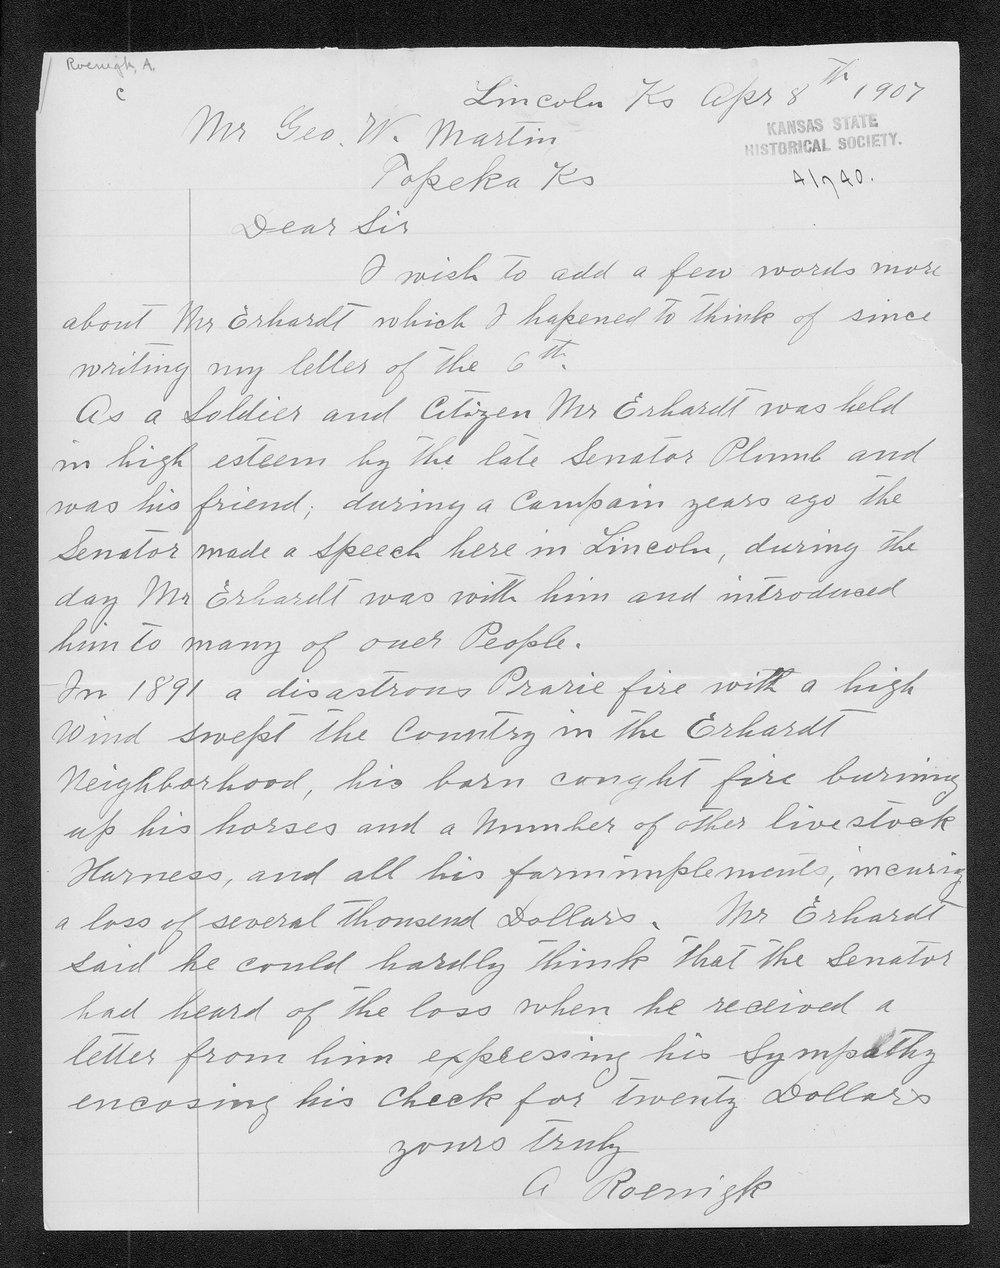 A. Roenigk to George W. Martin